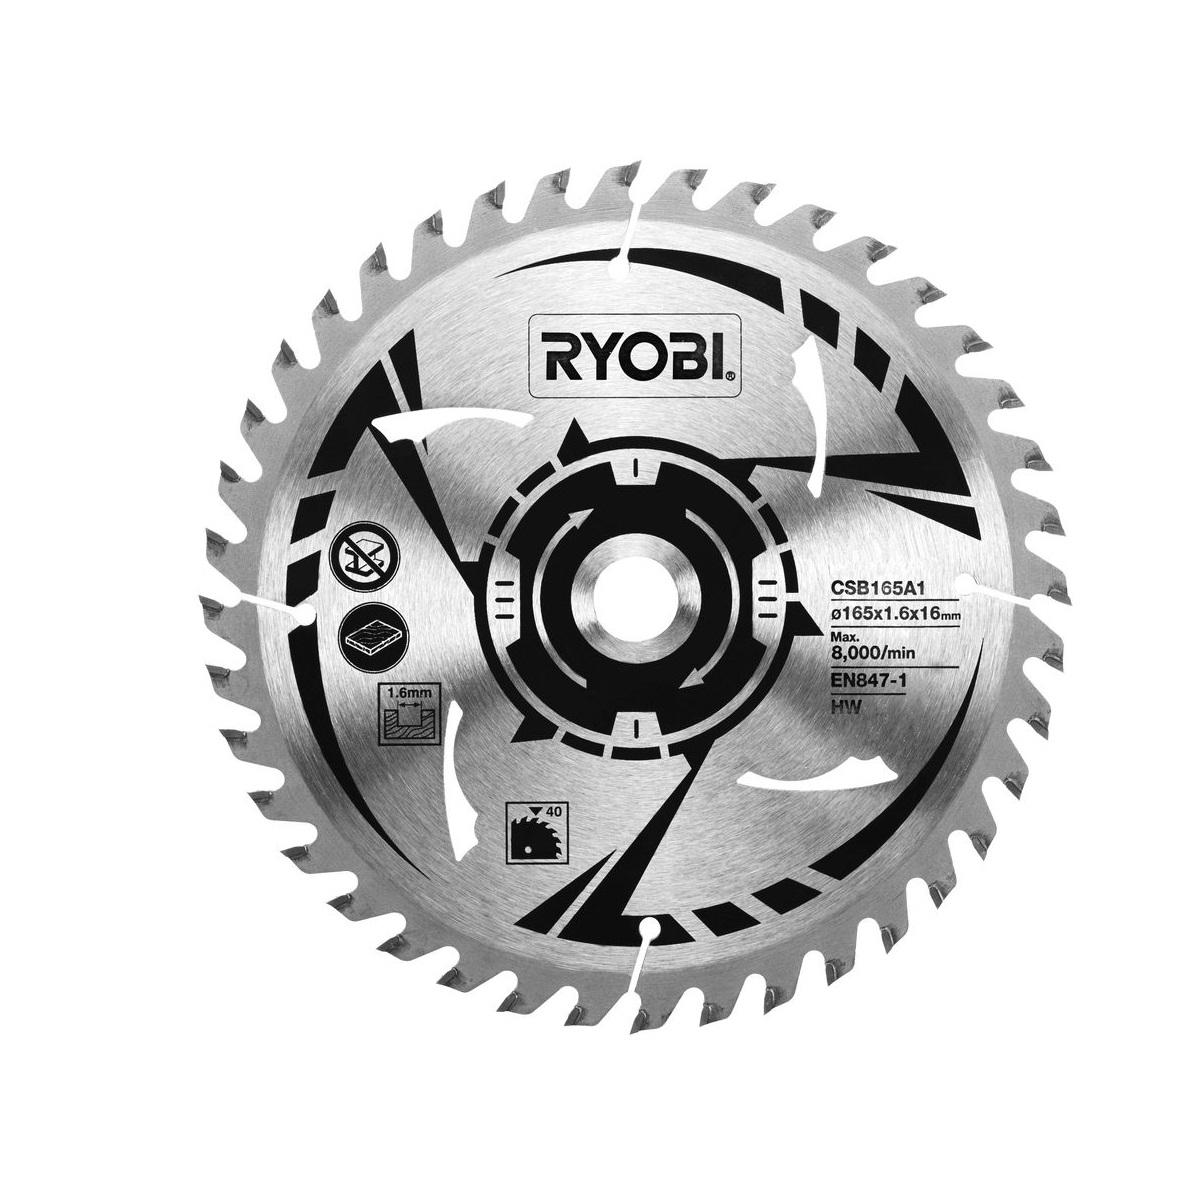 Ryobi CSB165A1pilový kotouč pr. 165/16mm, 40z. pro pily R18CS